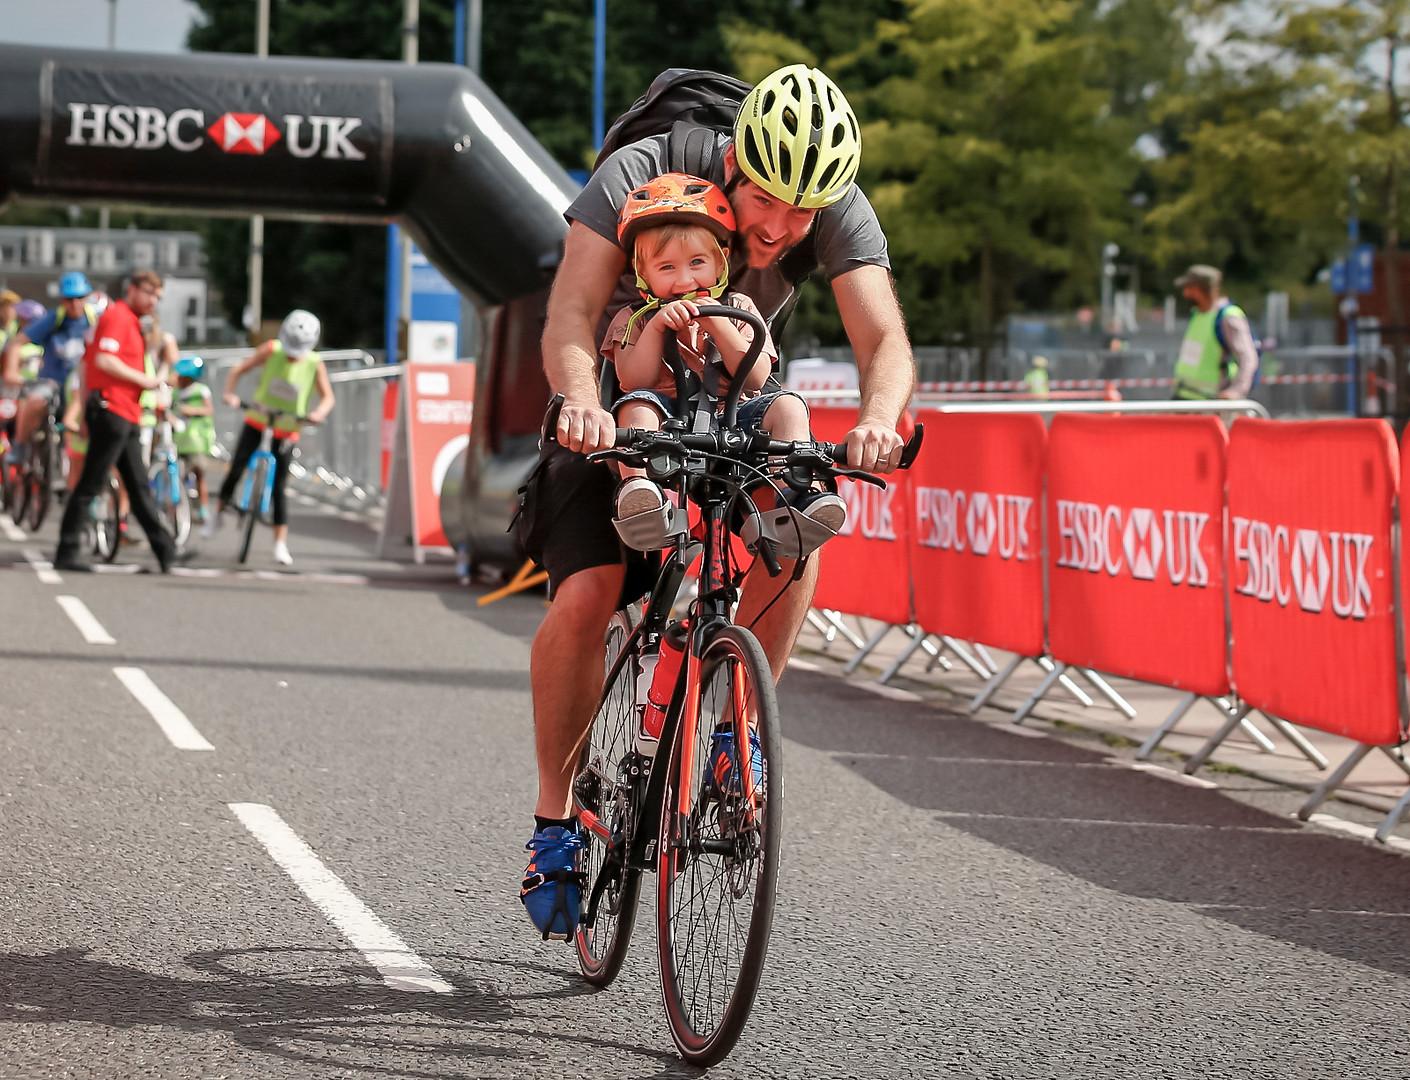 2017_08_13_HSBC_City_Ride_Leicester_2125